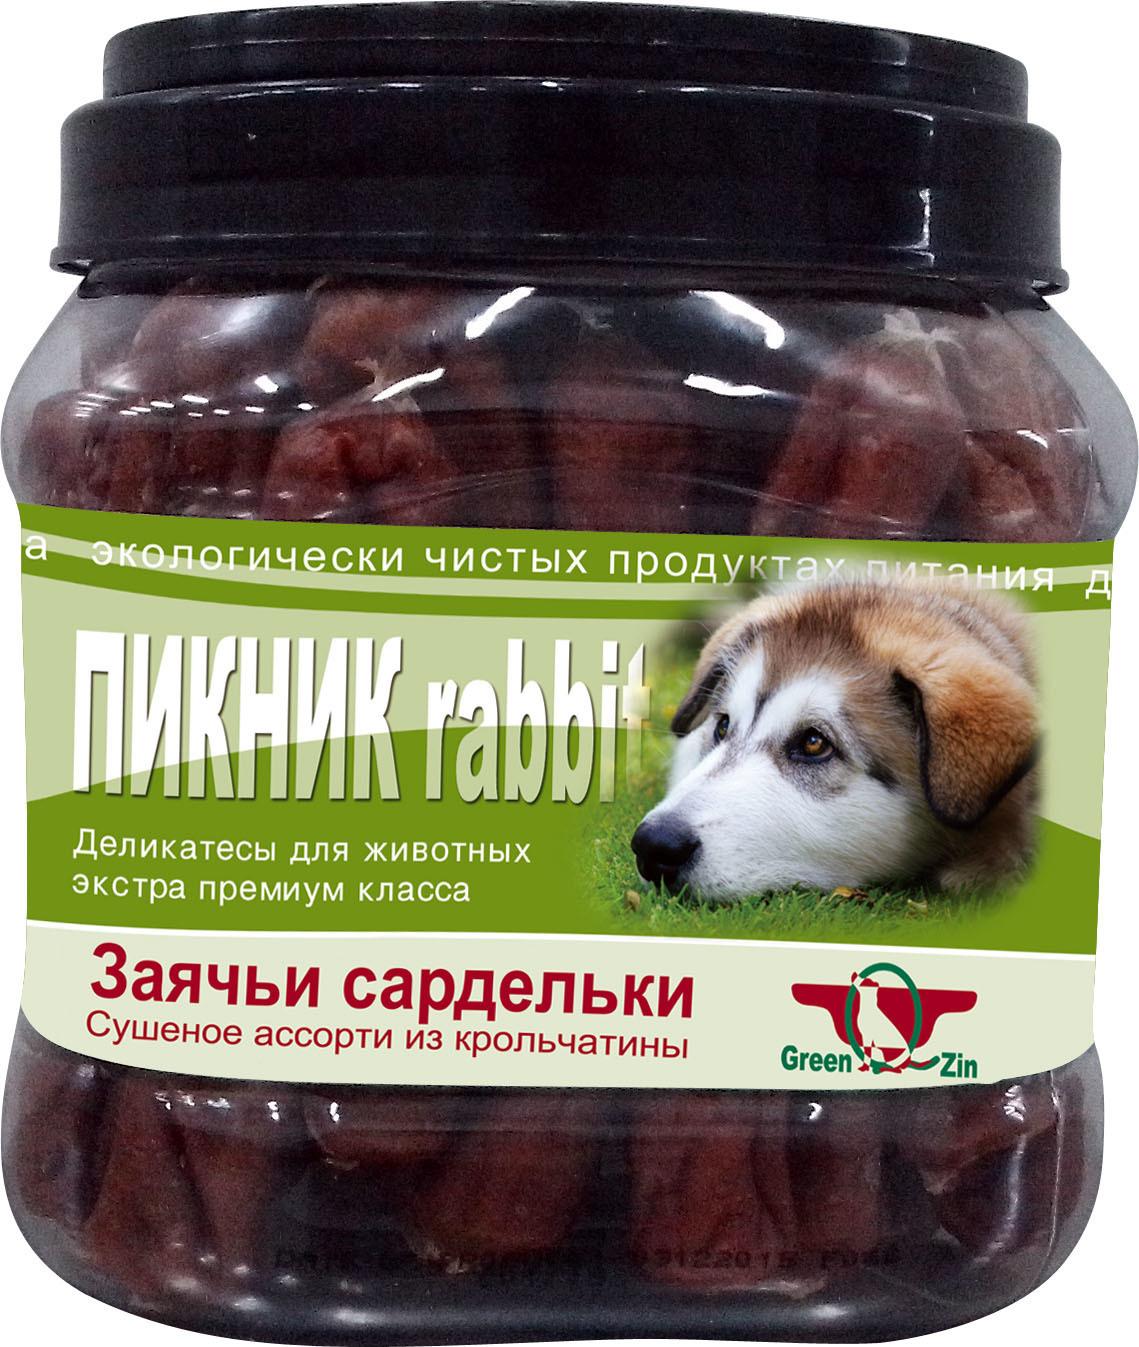 Лакомства Лакомство для собак Green Qzin Пикник Rabbit 311802890.jpg